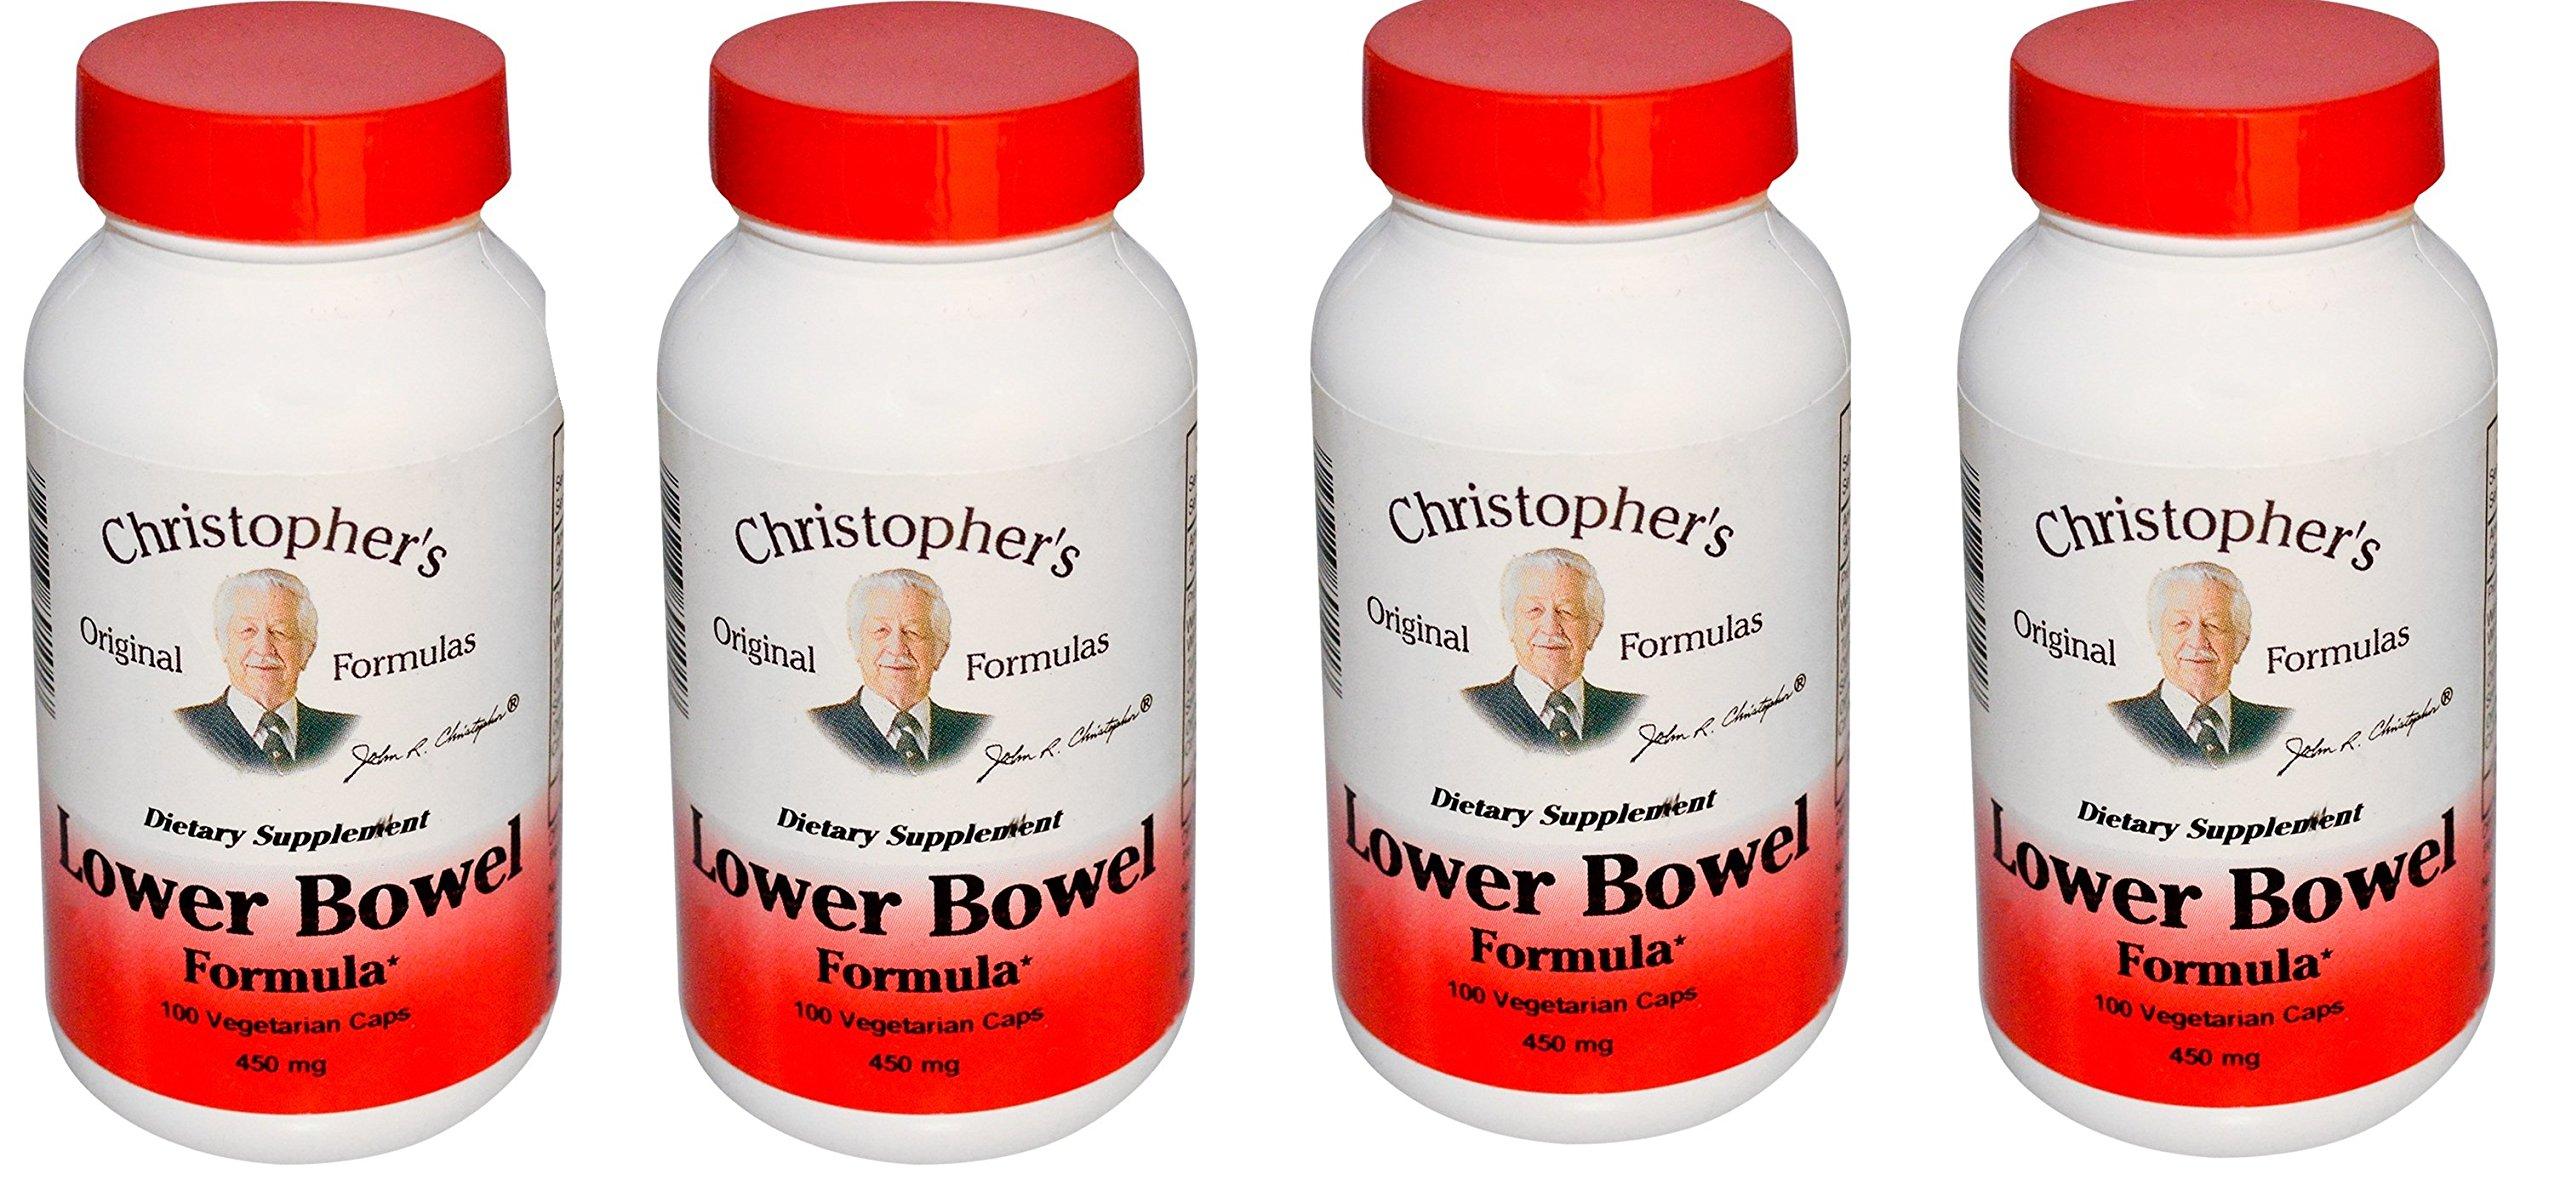 Dr. Christopher's: Lower Bowel Formula, 100 caps (4 pack)